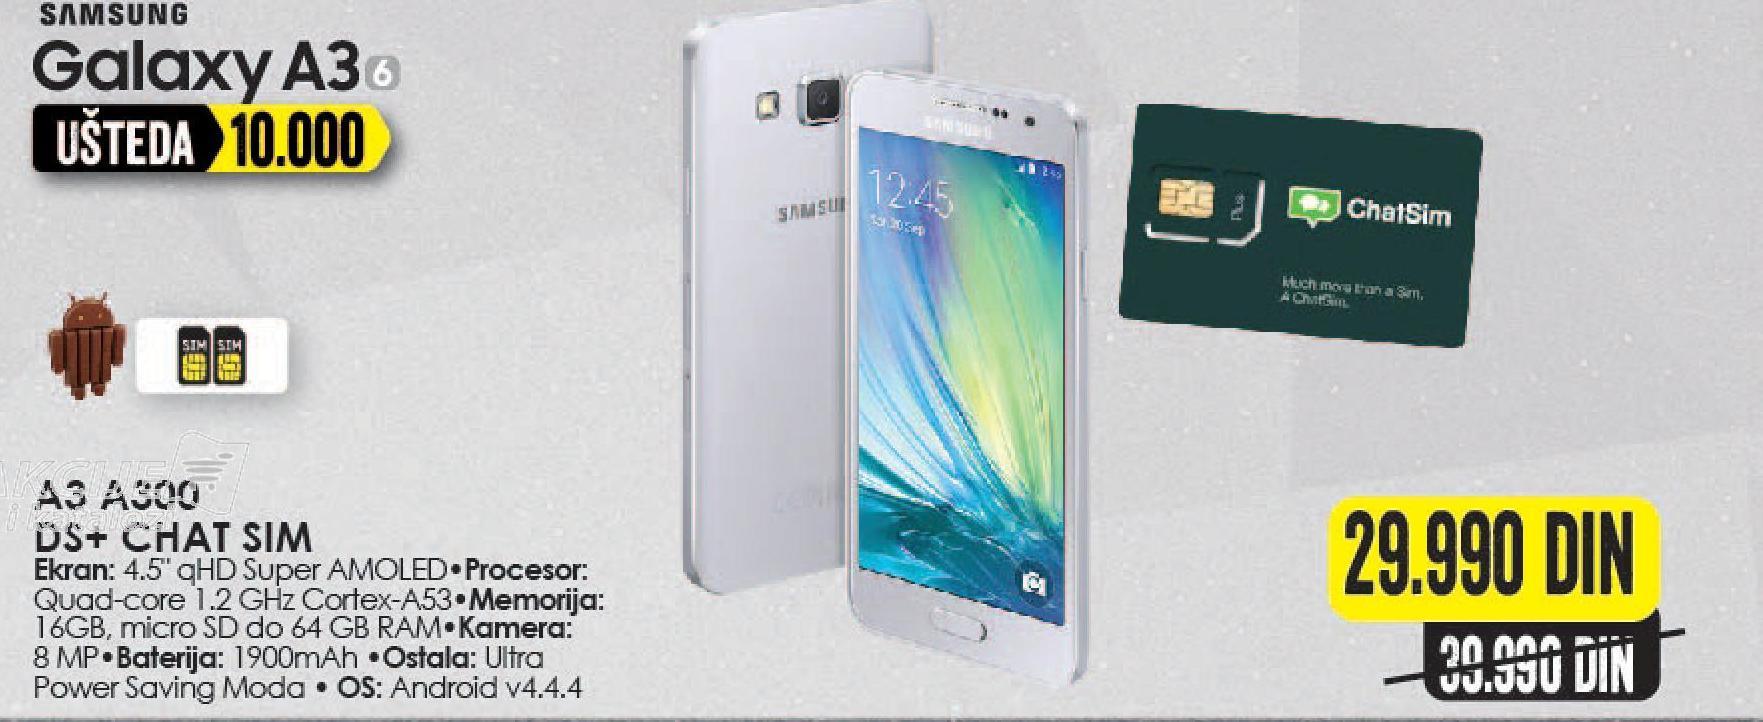 Mobilni telefon Galaxy A3 A300